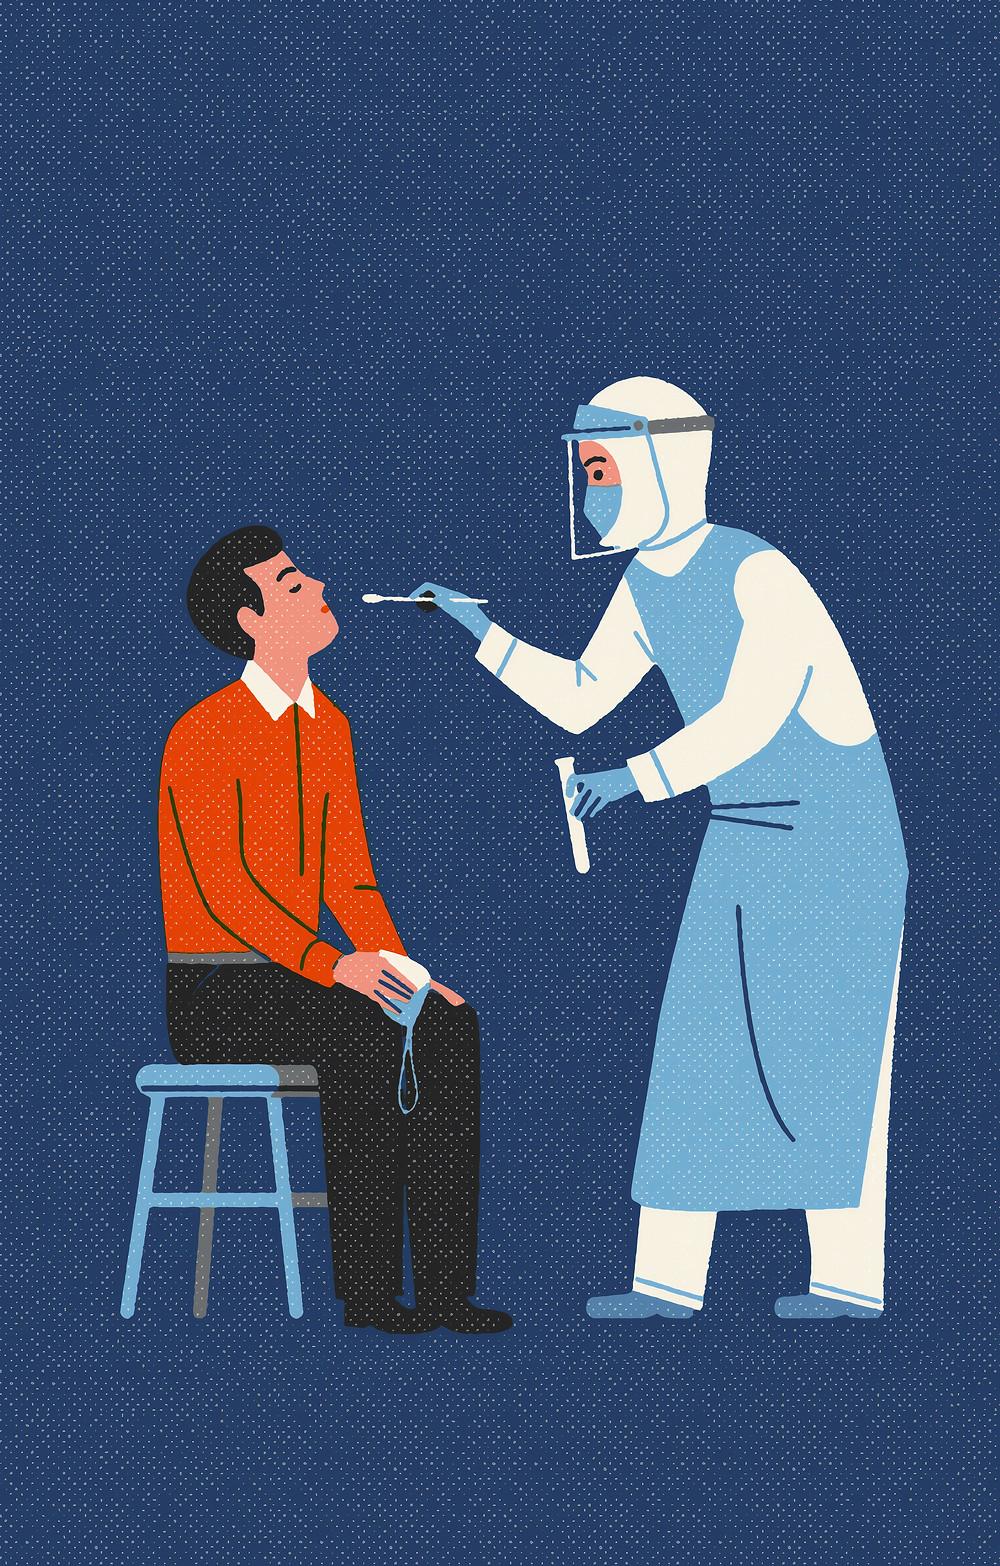 Frontline healthcare worker performing a Coronavirus-19 nasal swab test on a patient.